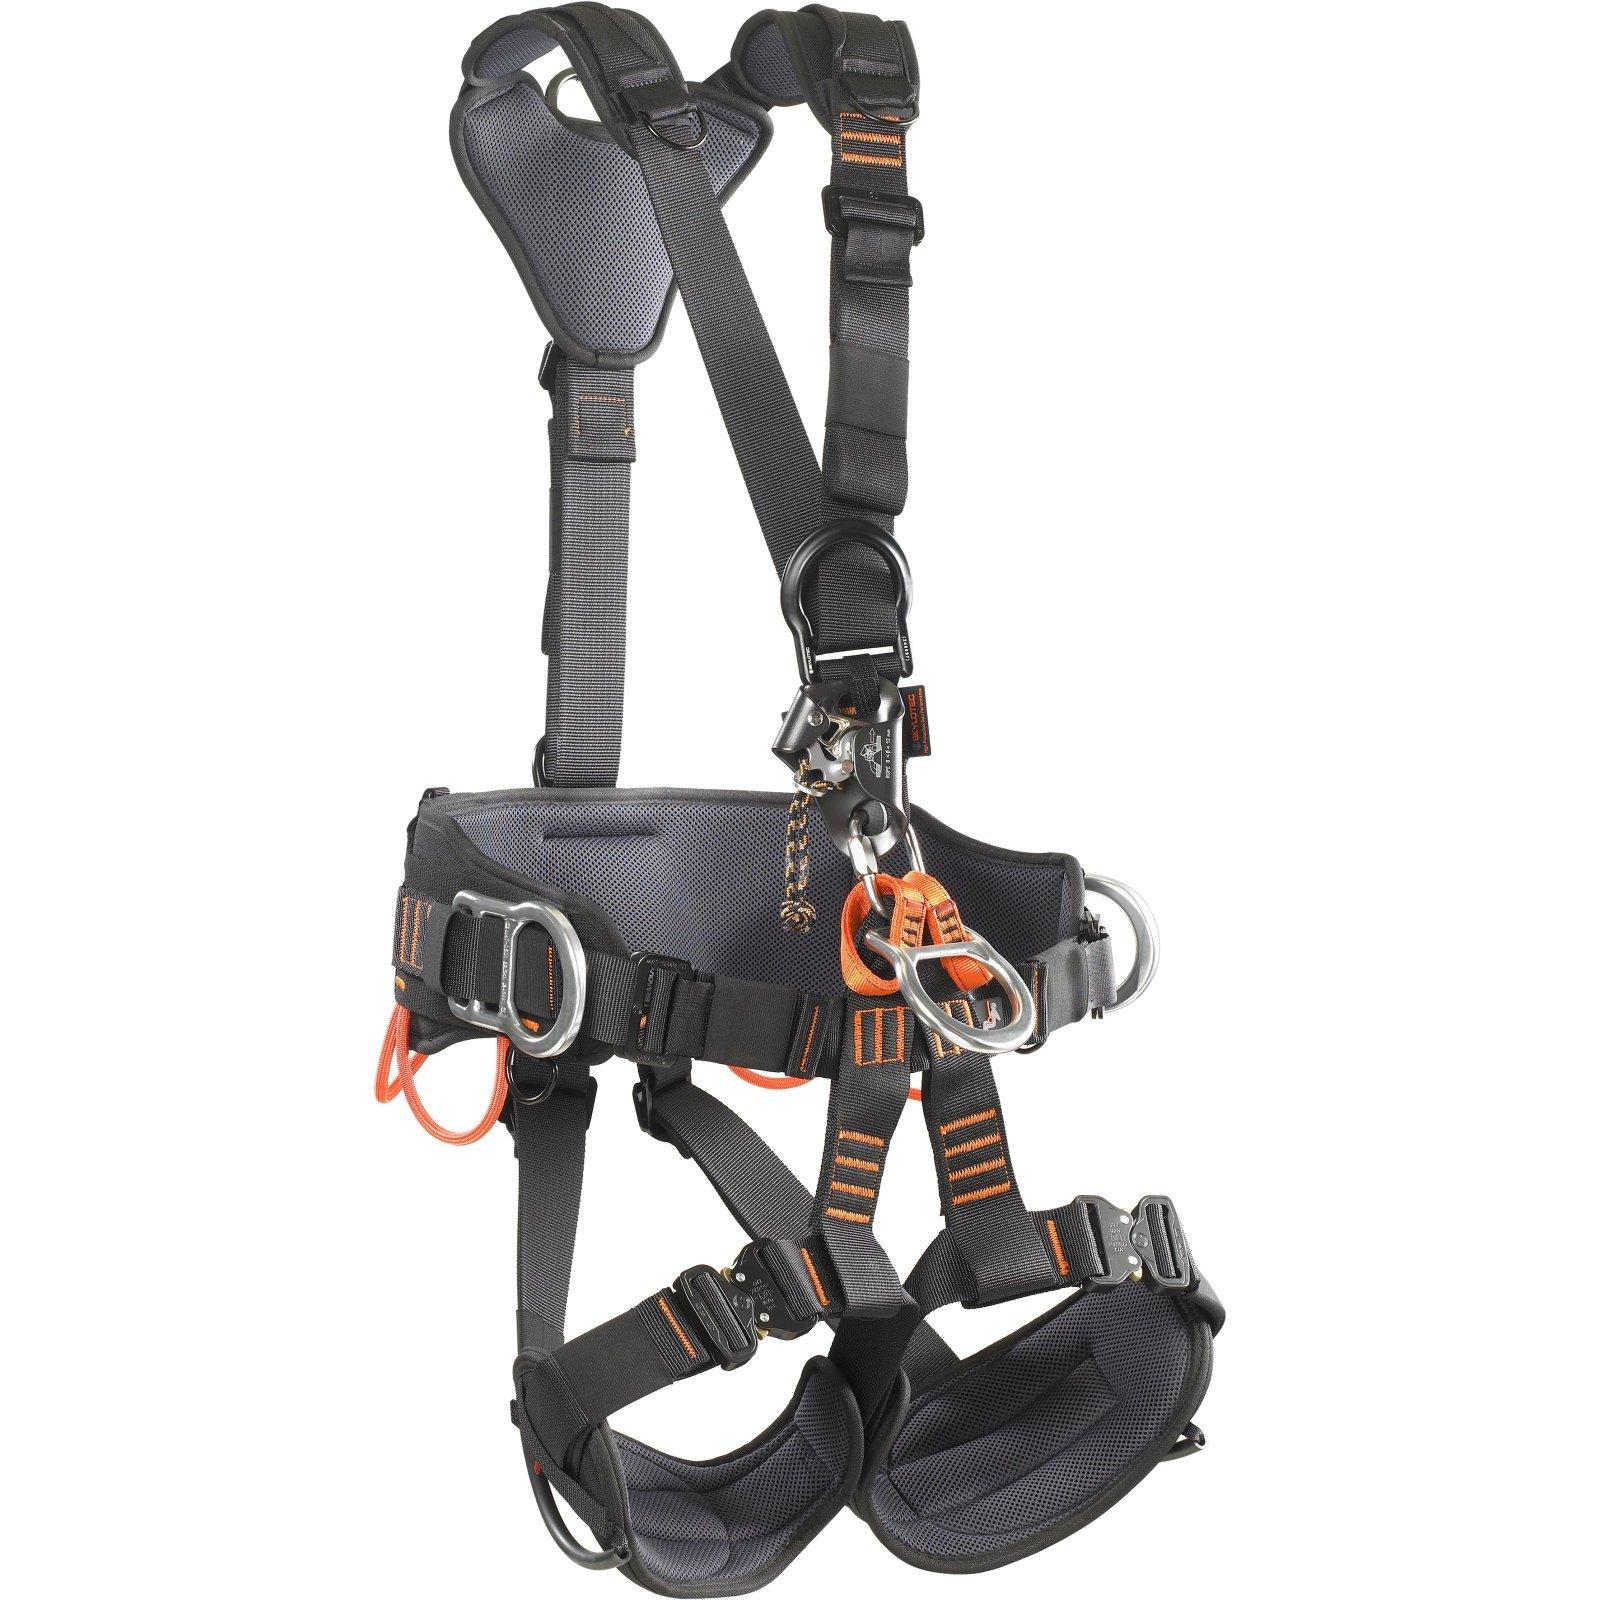 Skylotec G-1083-AL-XS/M Rescue Pro 2.0 Harness